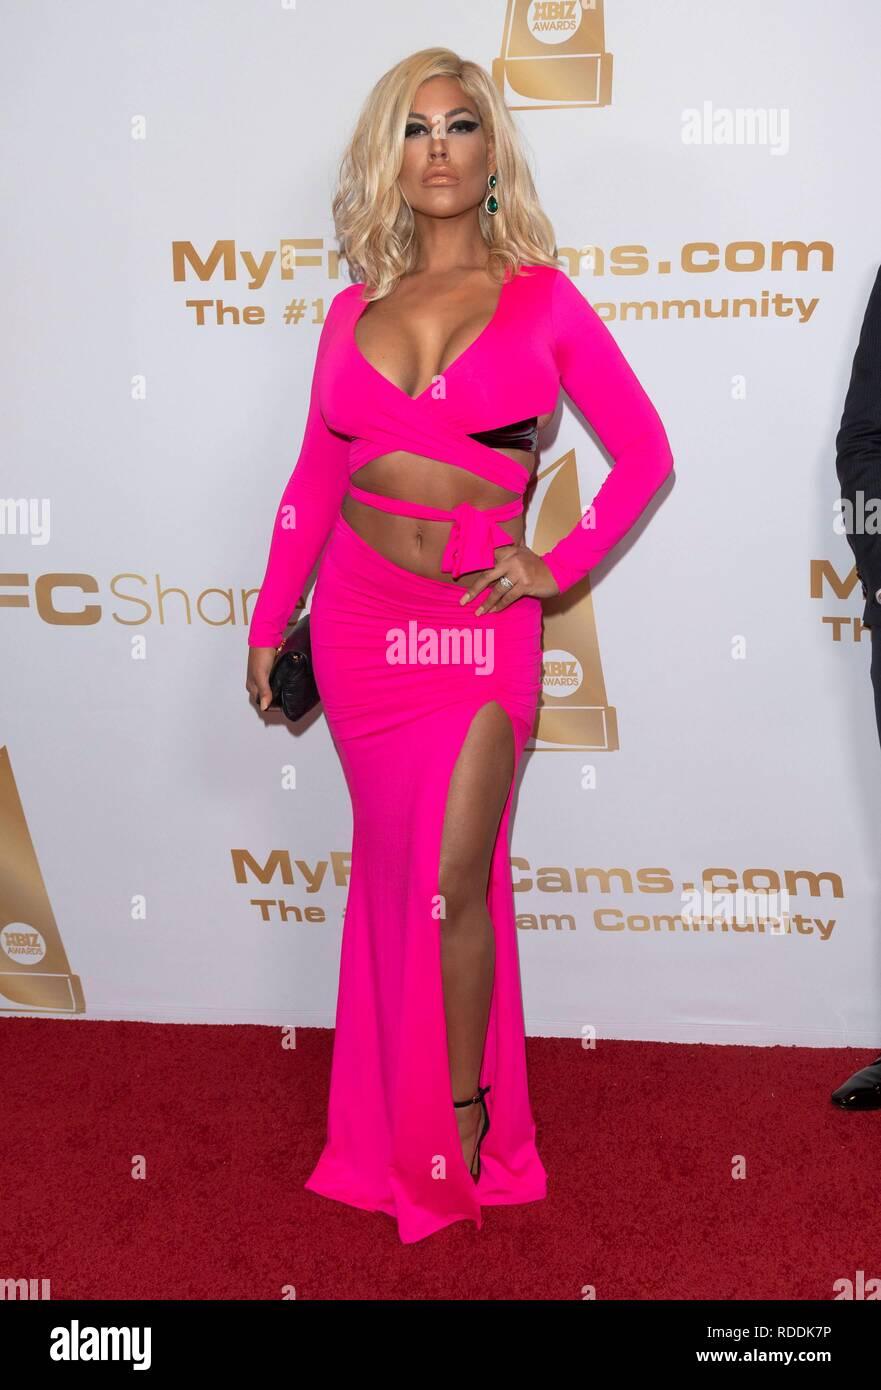 Celebrity Bridgette B nude (34 photos), Pussy, Bikini, Feet, underwear 2018